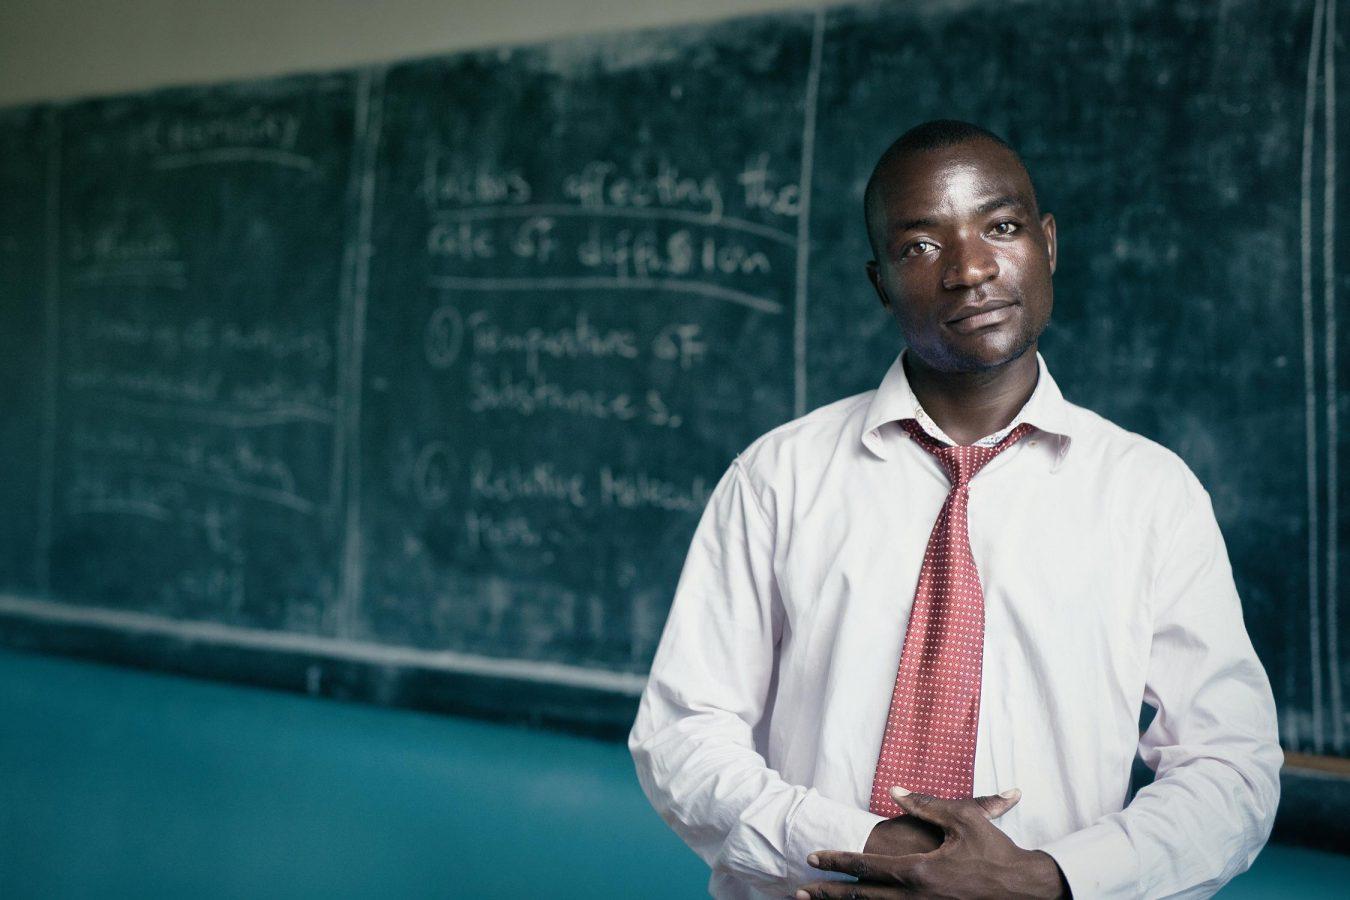 editorial-photography-portrait-malawi-science-teacher-namisu